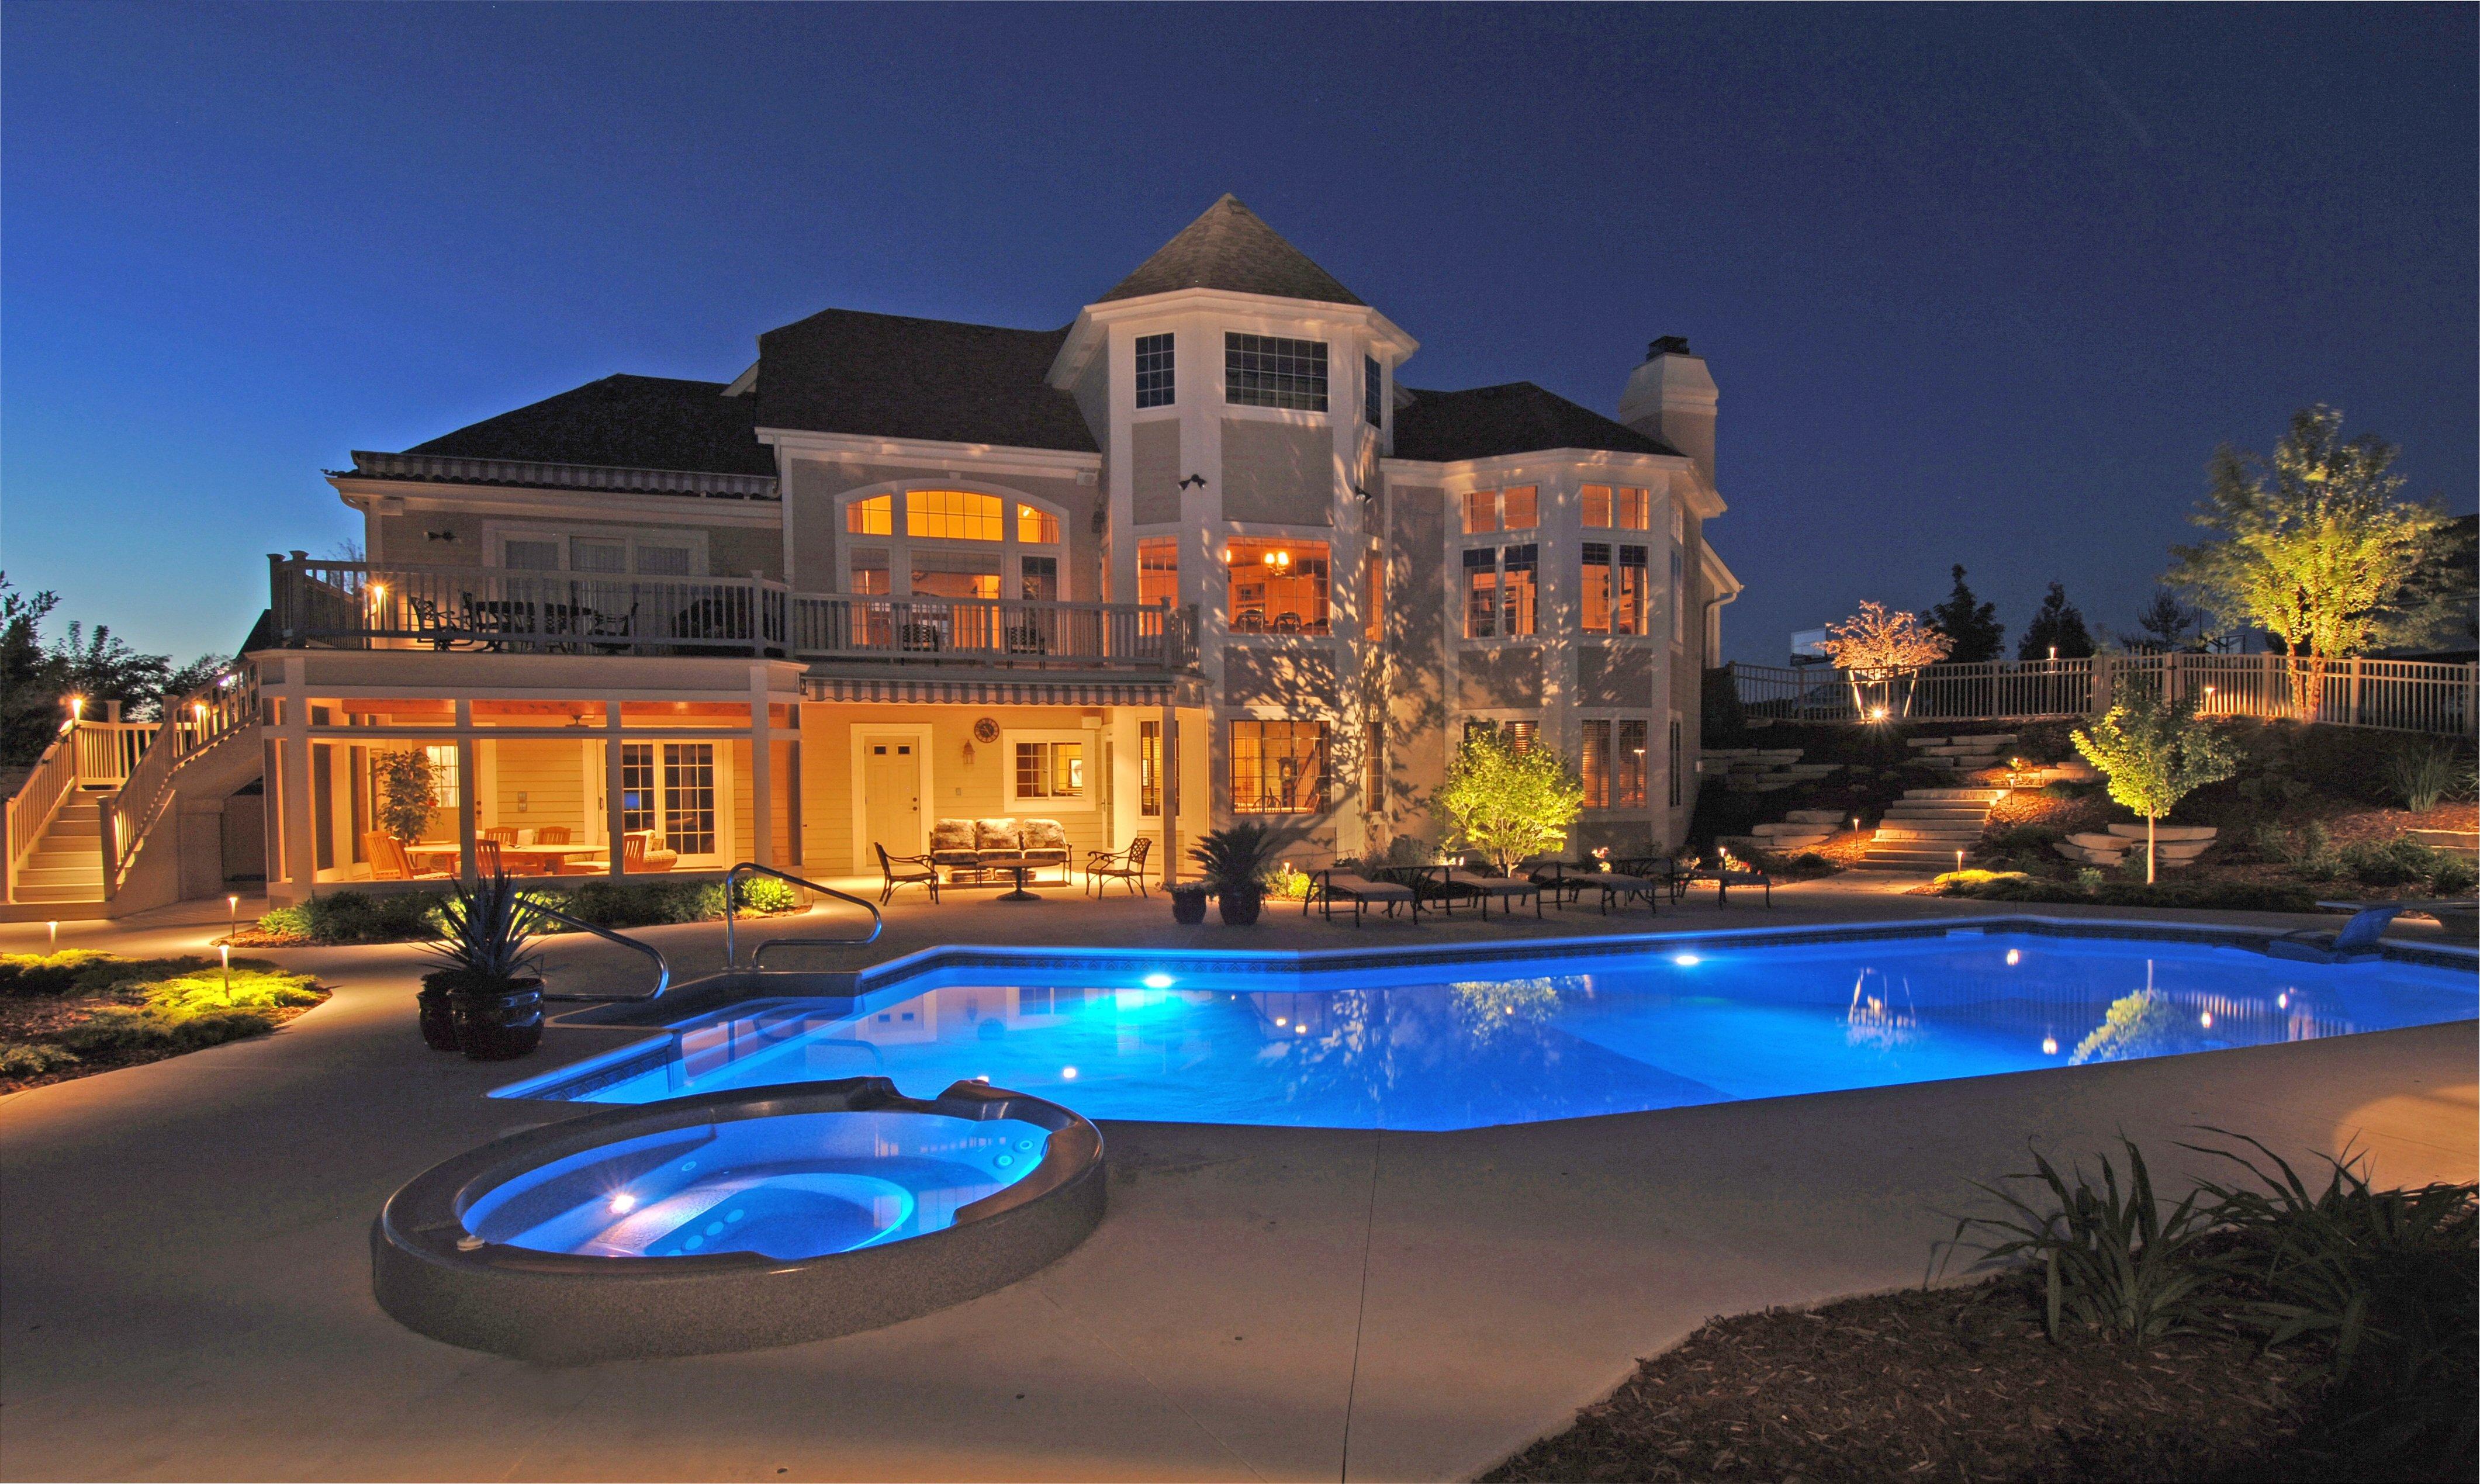 Pool_decks_patio_lighting_home_exterior_outdoor_lighting_fixtures_world_class_outdoor_lighting.jpg